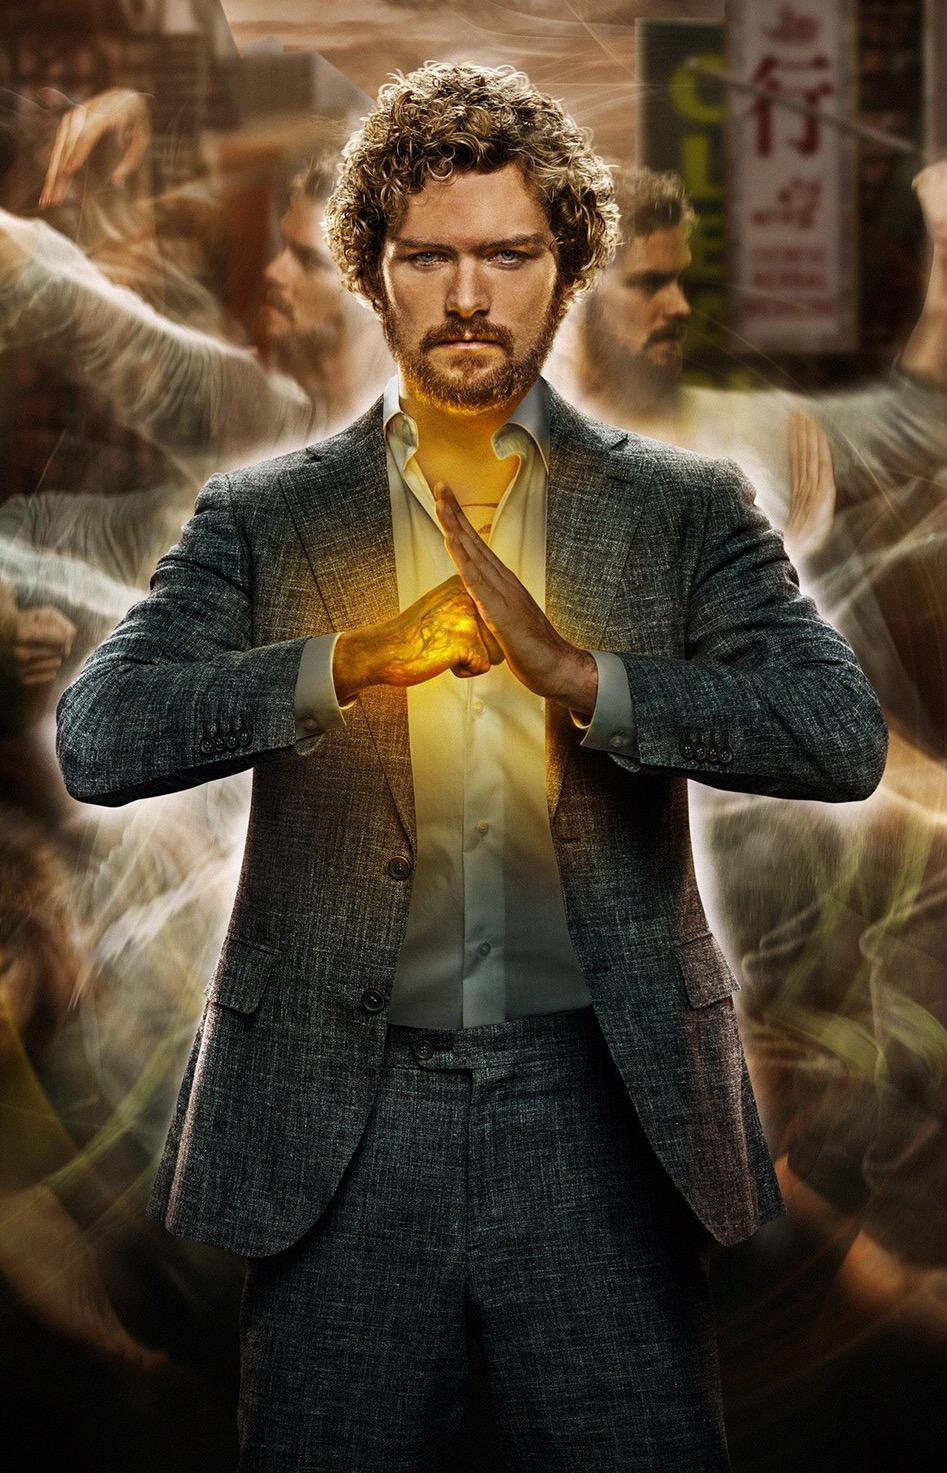 Danny Rand/Iron Fist